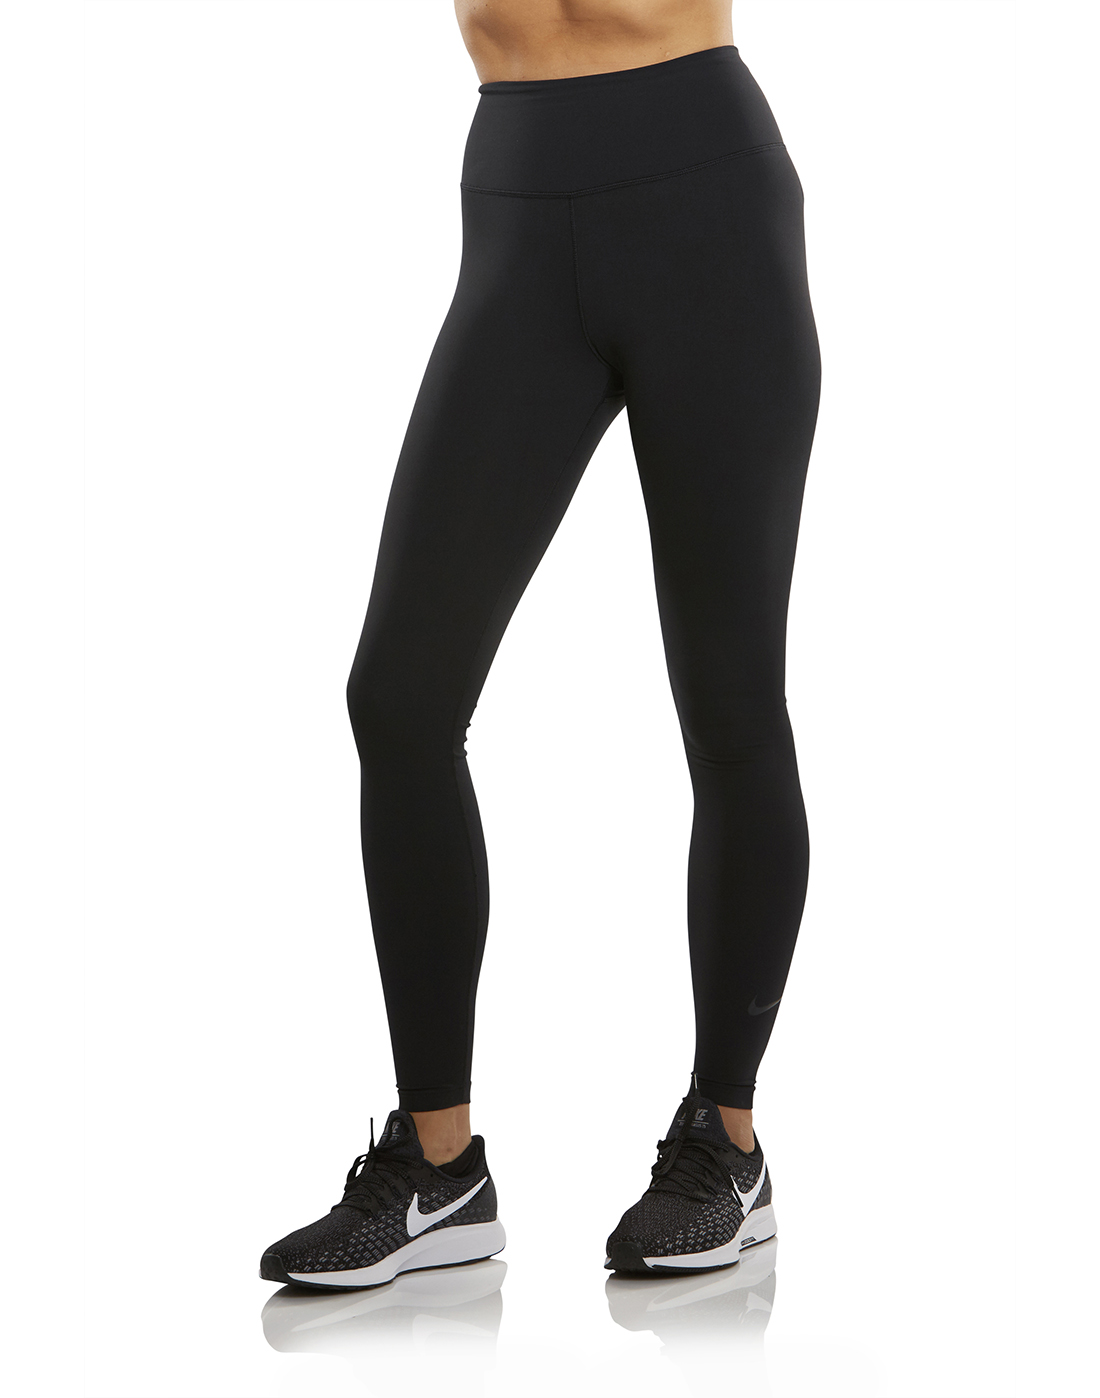 664af8bccd02fd Women's Nike Sculpt Lux Yoga Pants | Black | Life Style Sports